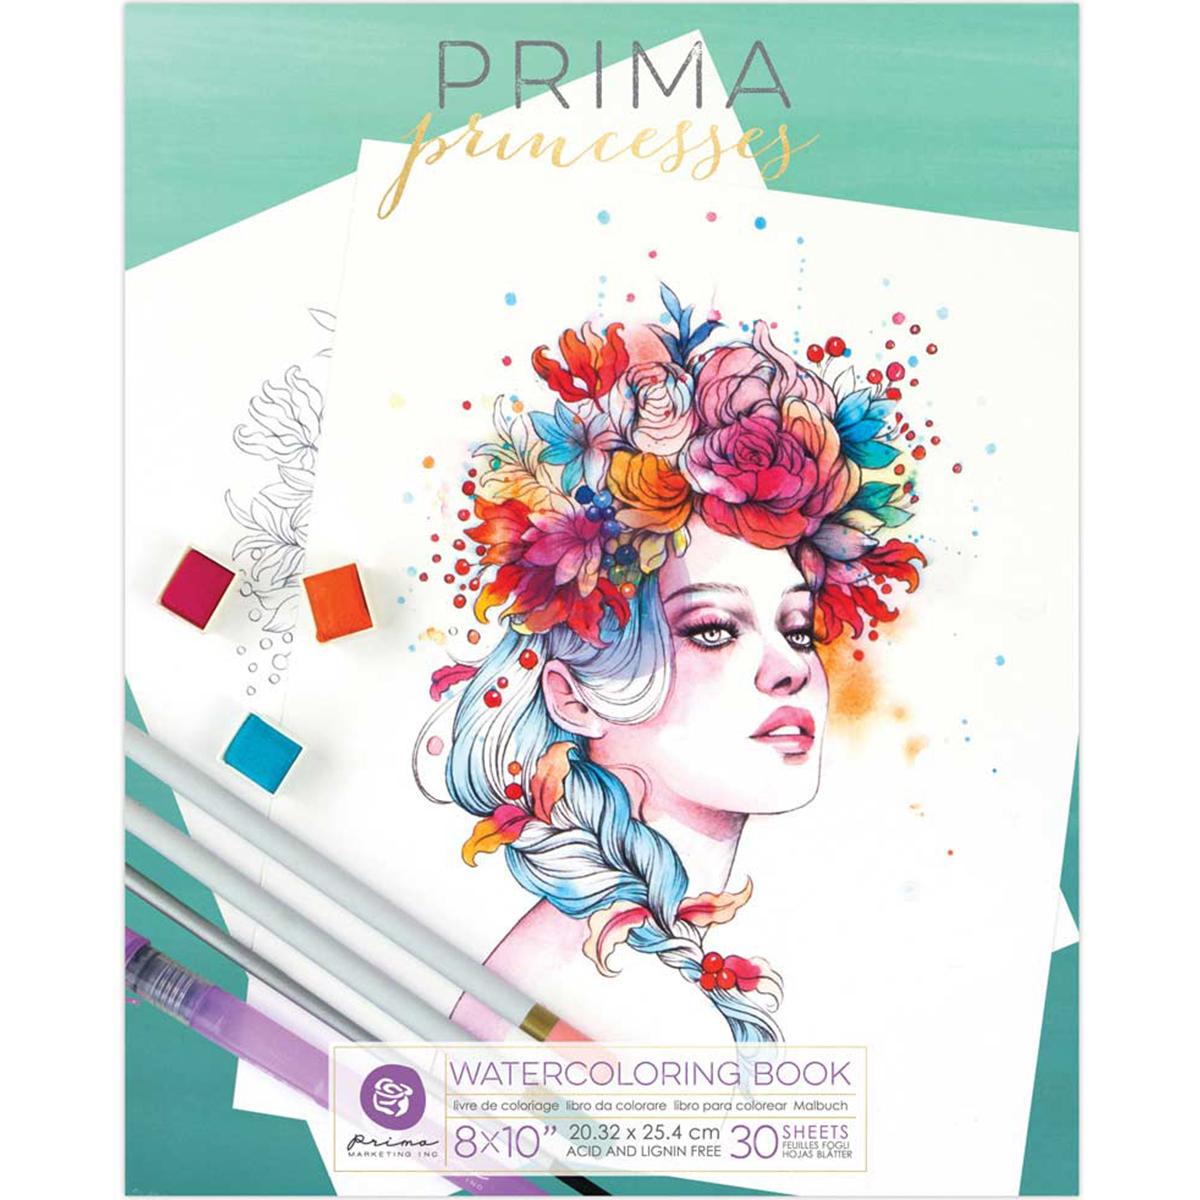 Prima - Watercolor Coloring Book - Princesses 8X10